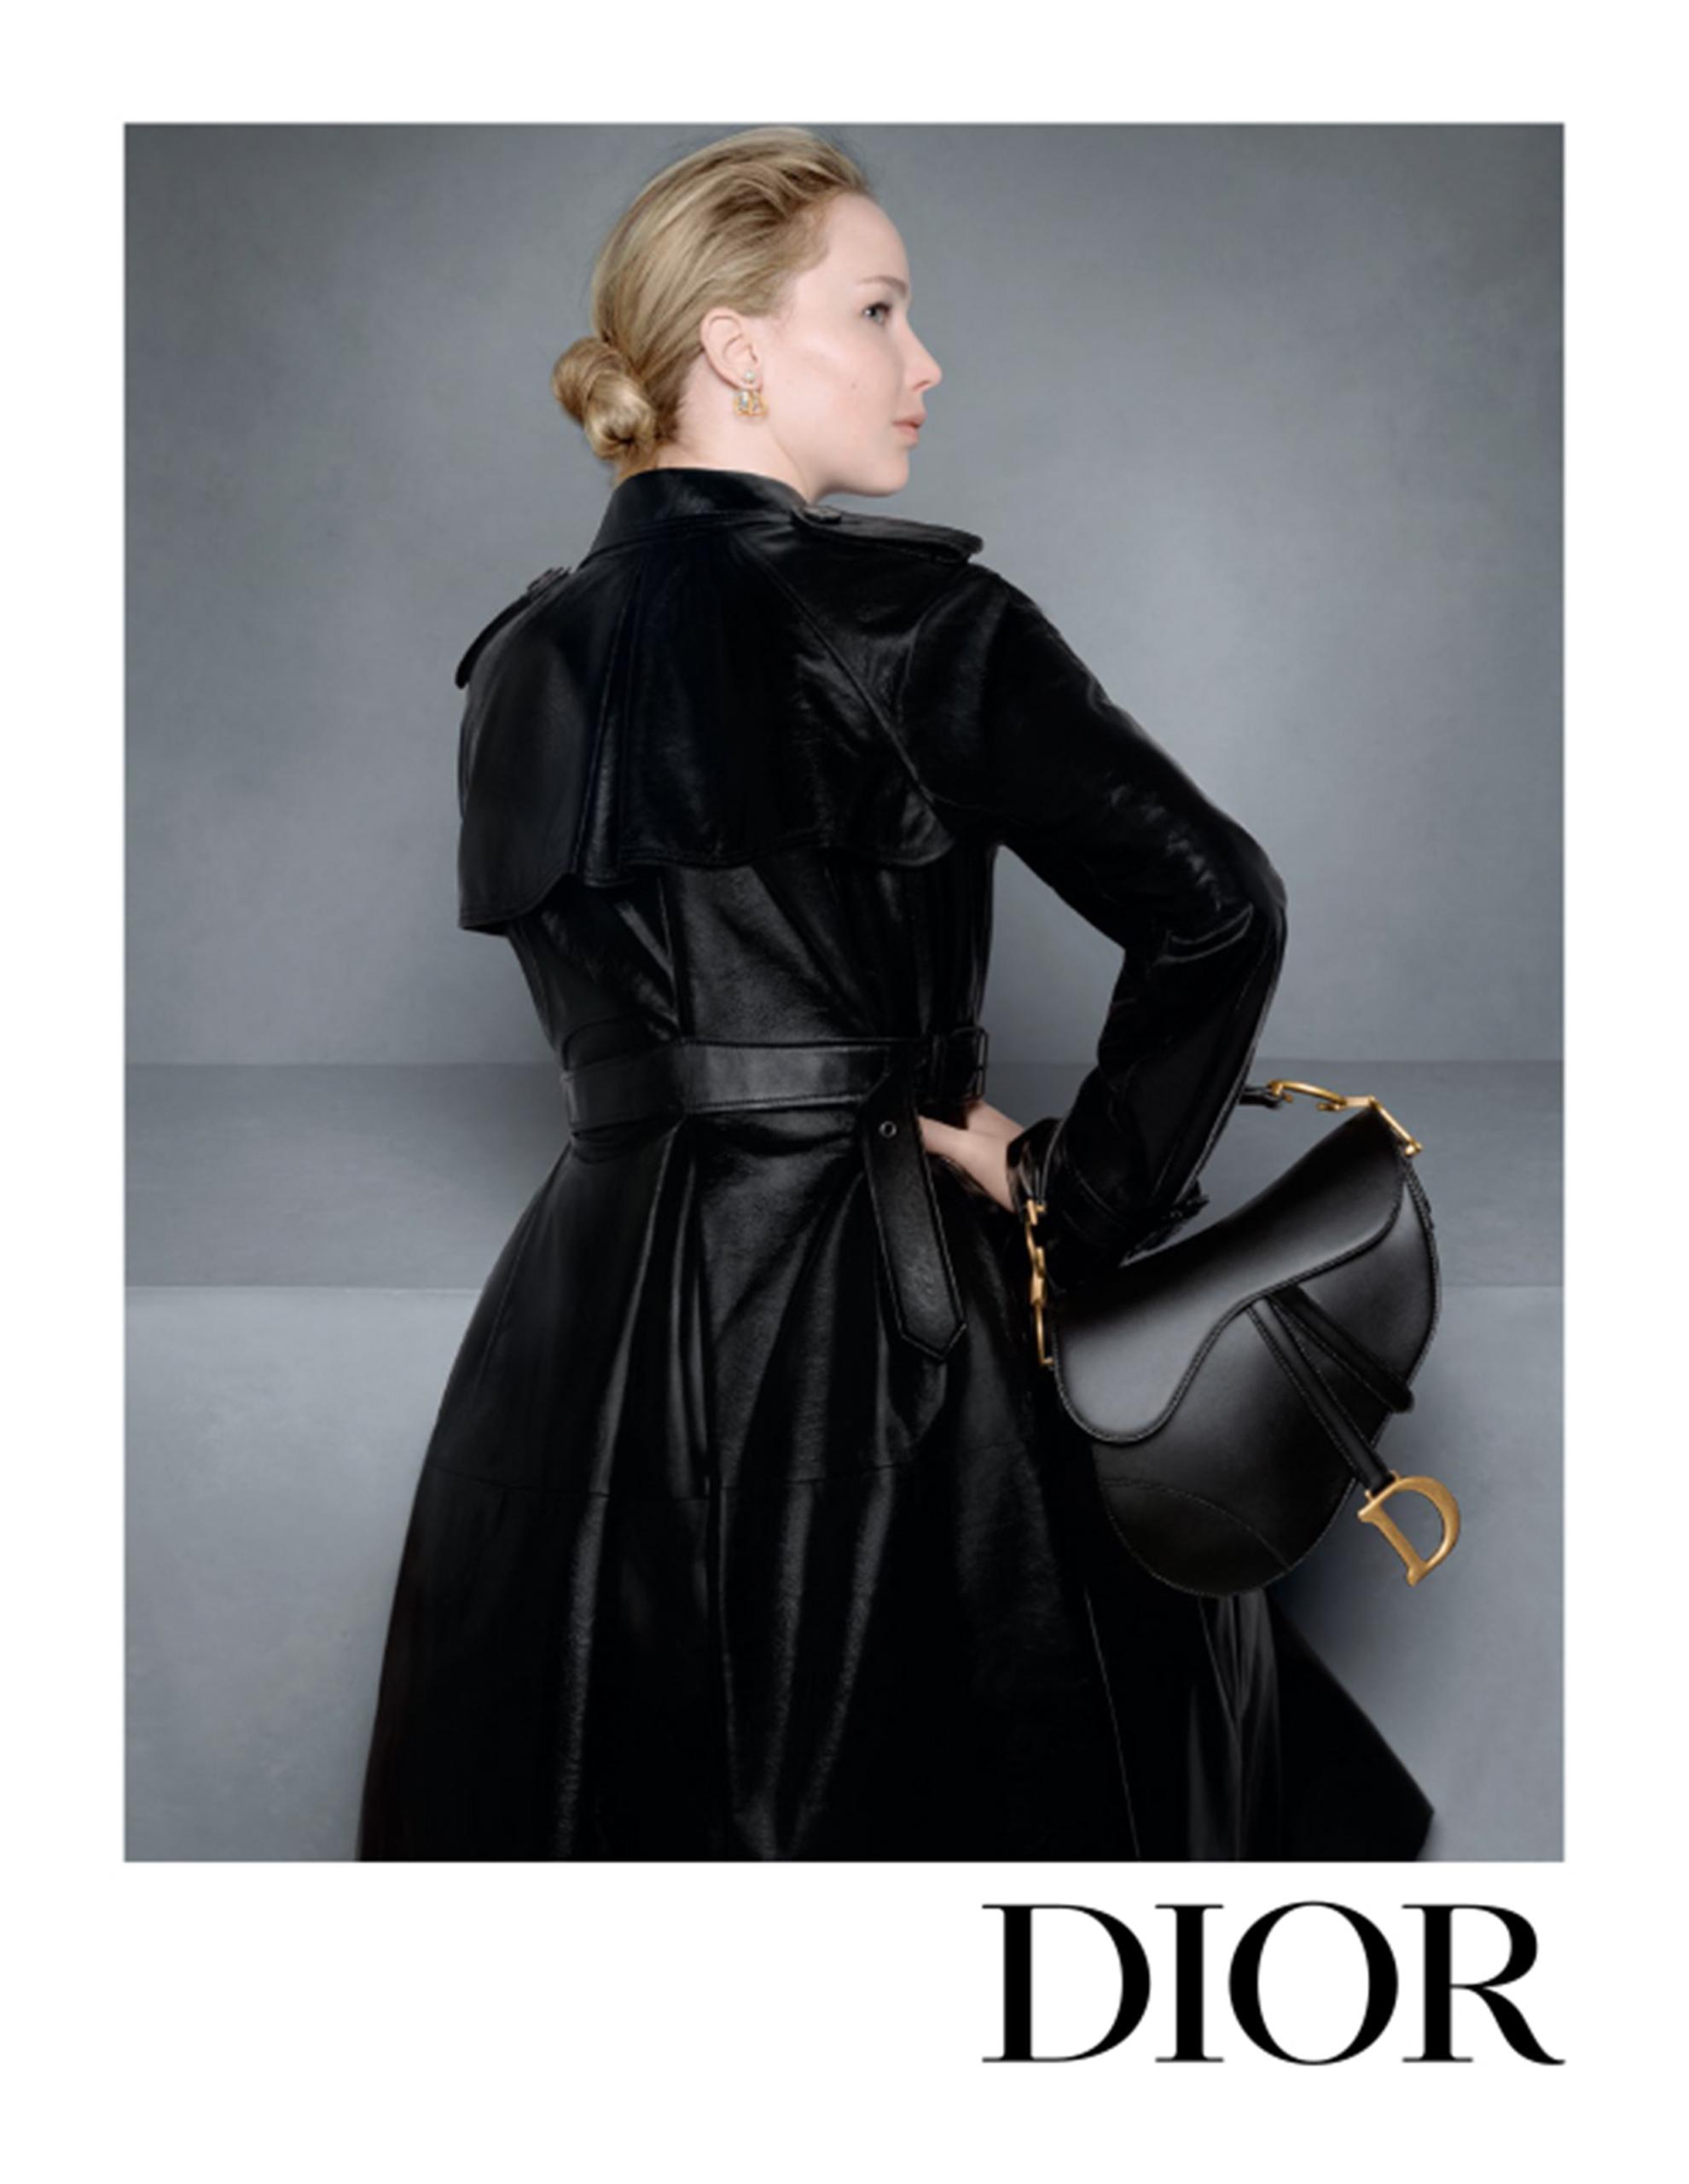 Dior campagna donna autunno 2020